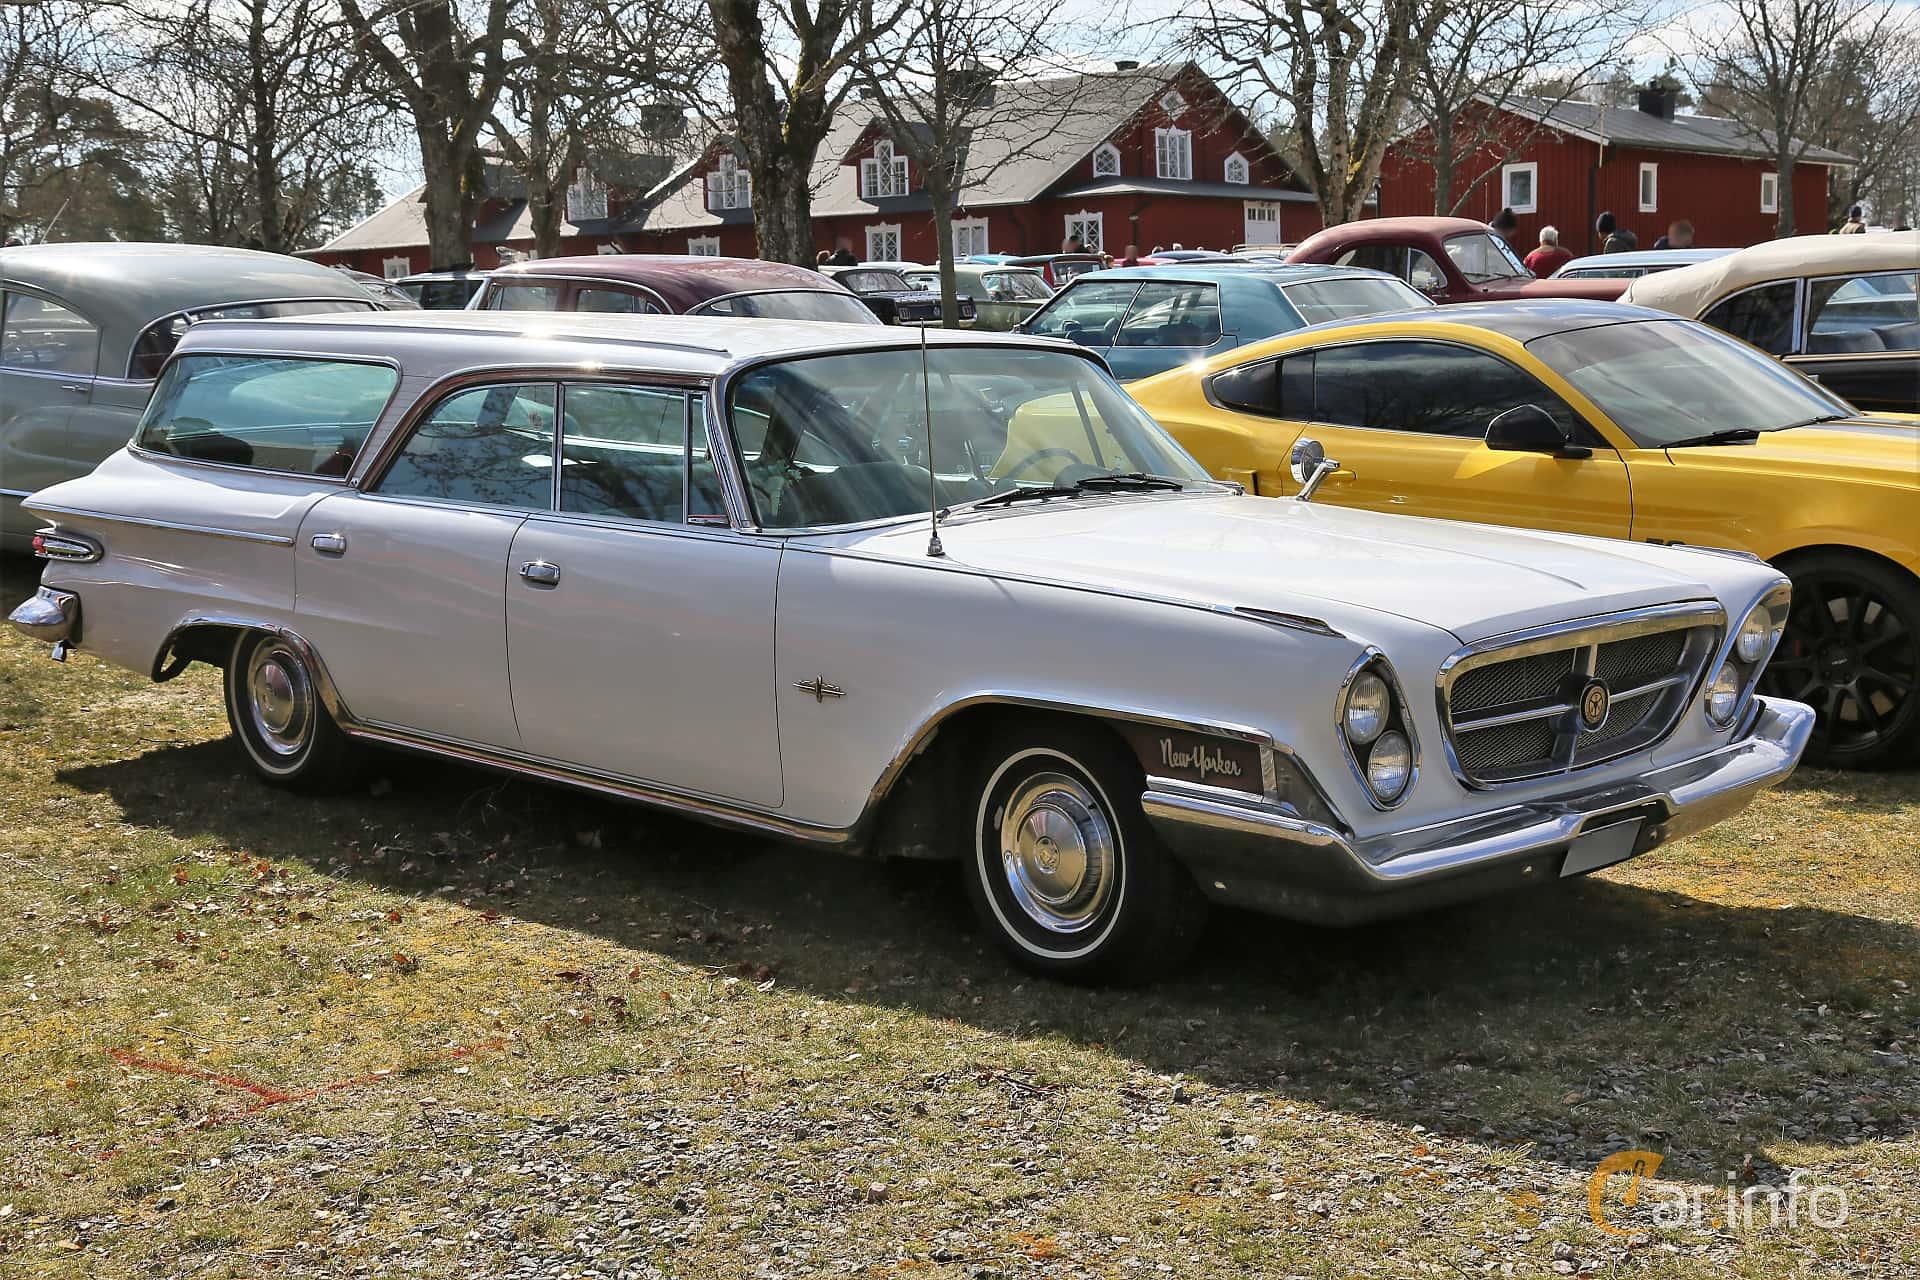 Chrysler New Yorker Town & Country 6.8 V8 TorqueFlite, 345hp, 1962 at Uddevalla Veteranbilsmarknad Backamo, Ljungsk 2019